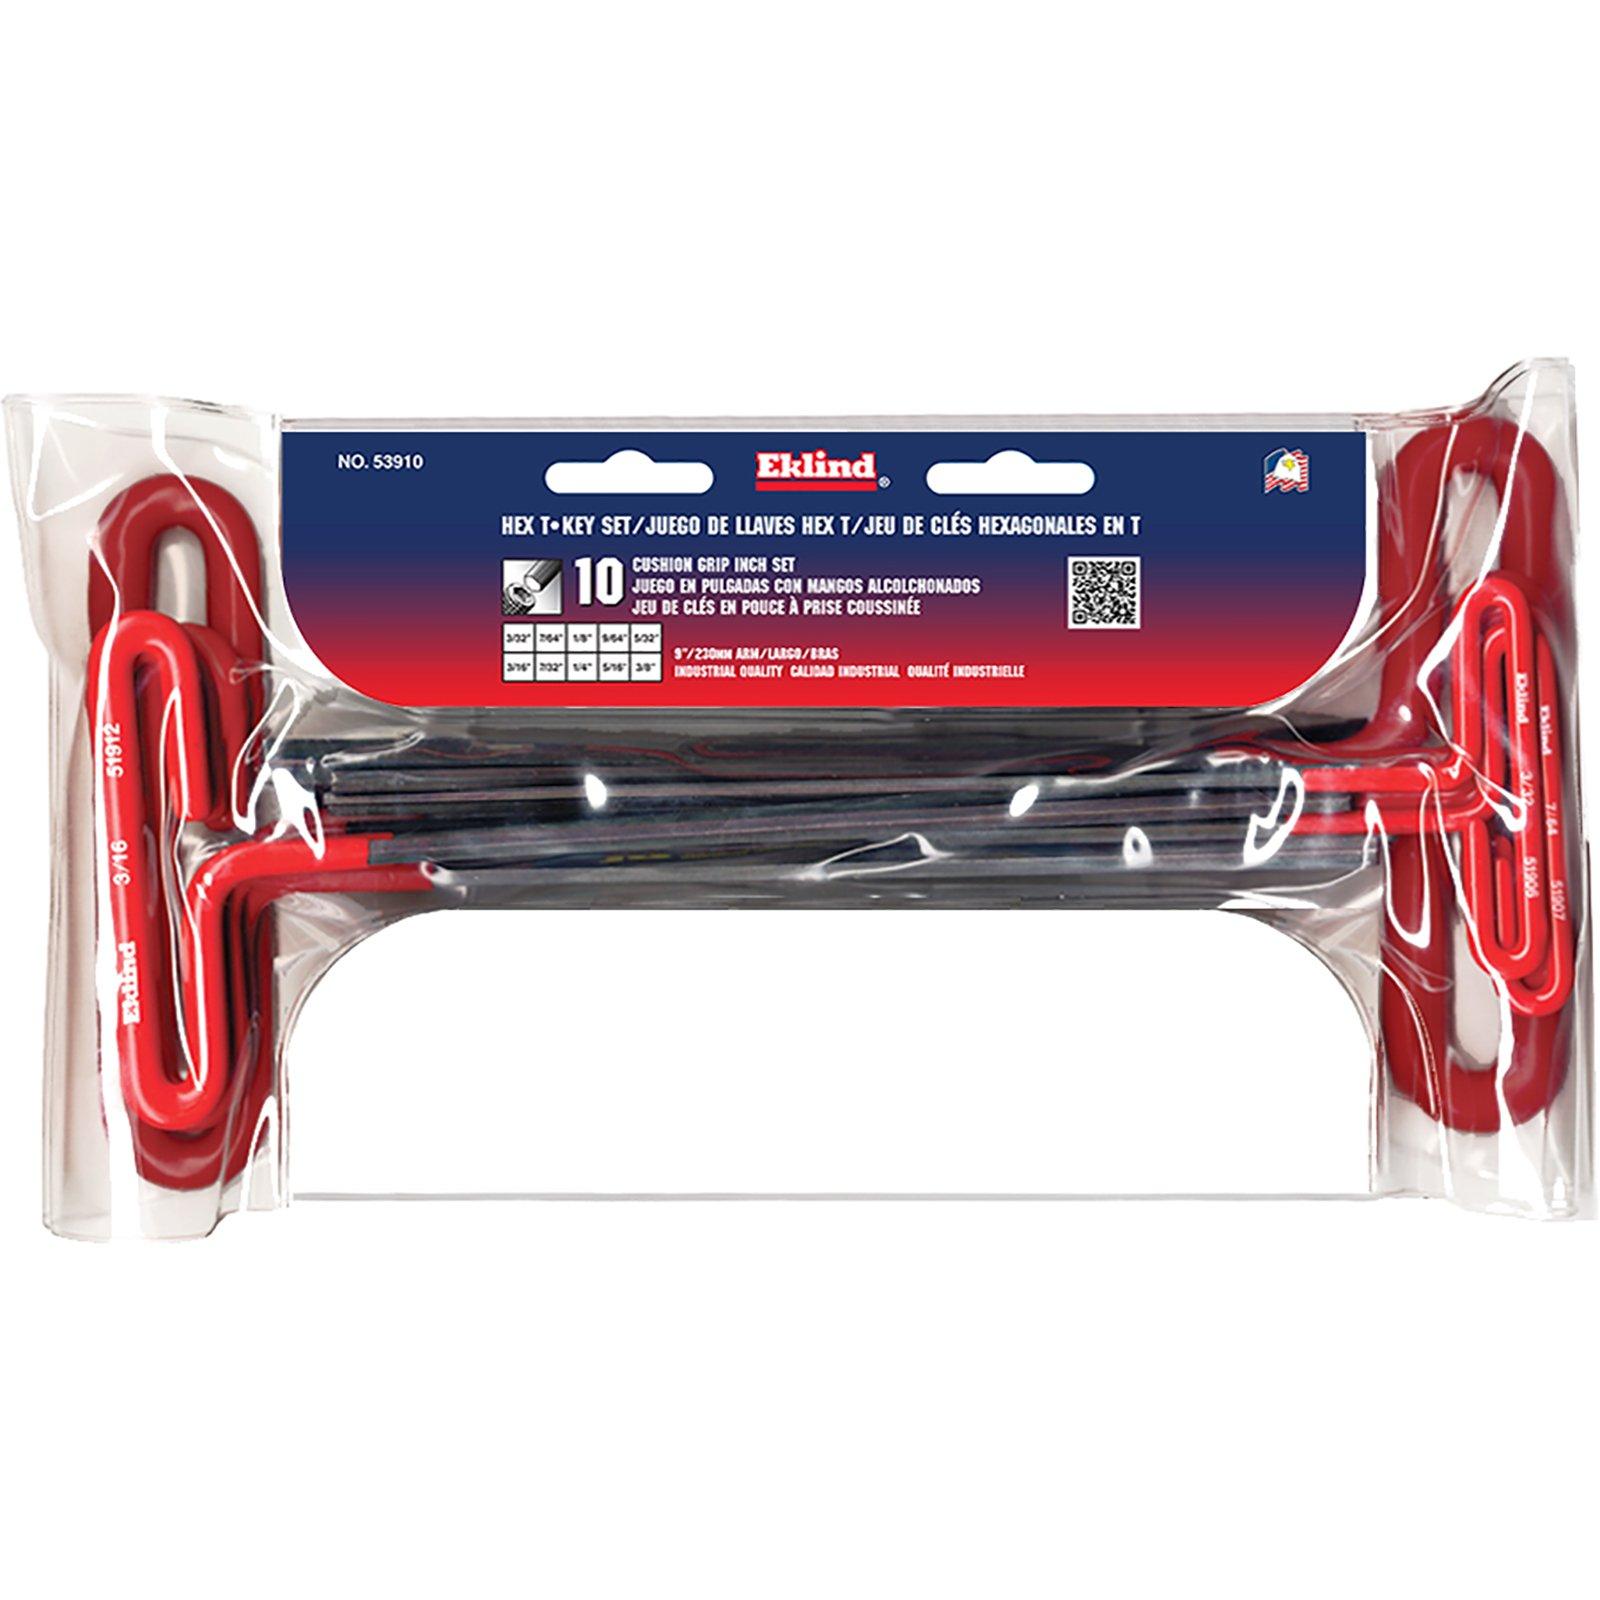 EKLIND 53910 Cushion Grip Hex T-Key allen wrench - 10pc set SAE Inch Sizes 3/32-3/8 9in series by Eklind Tool